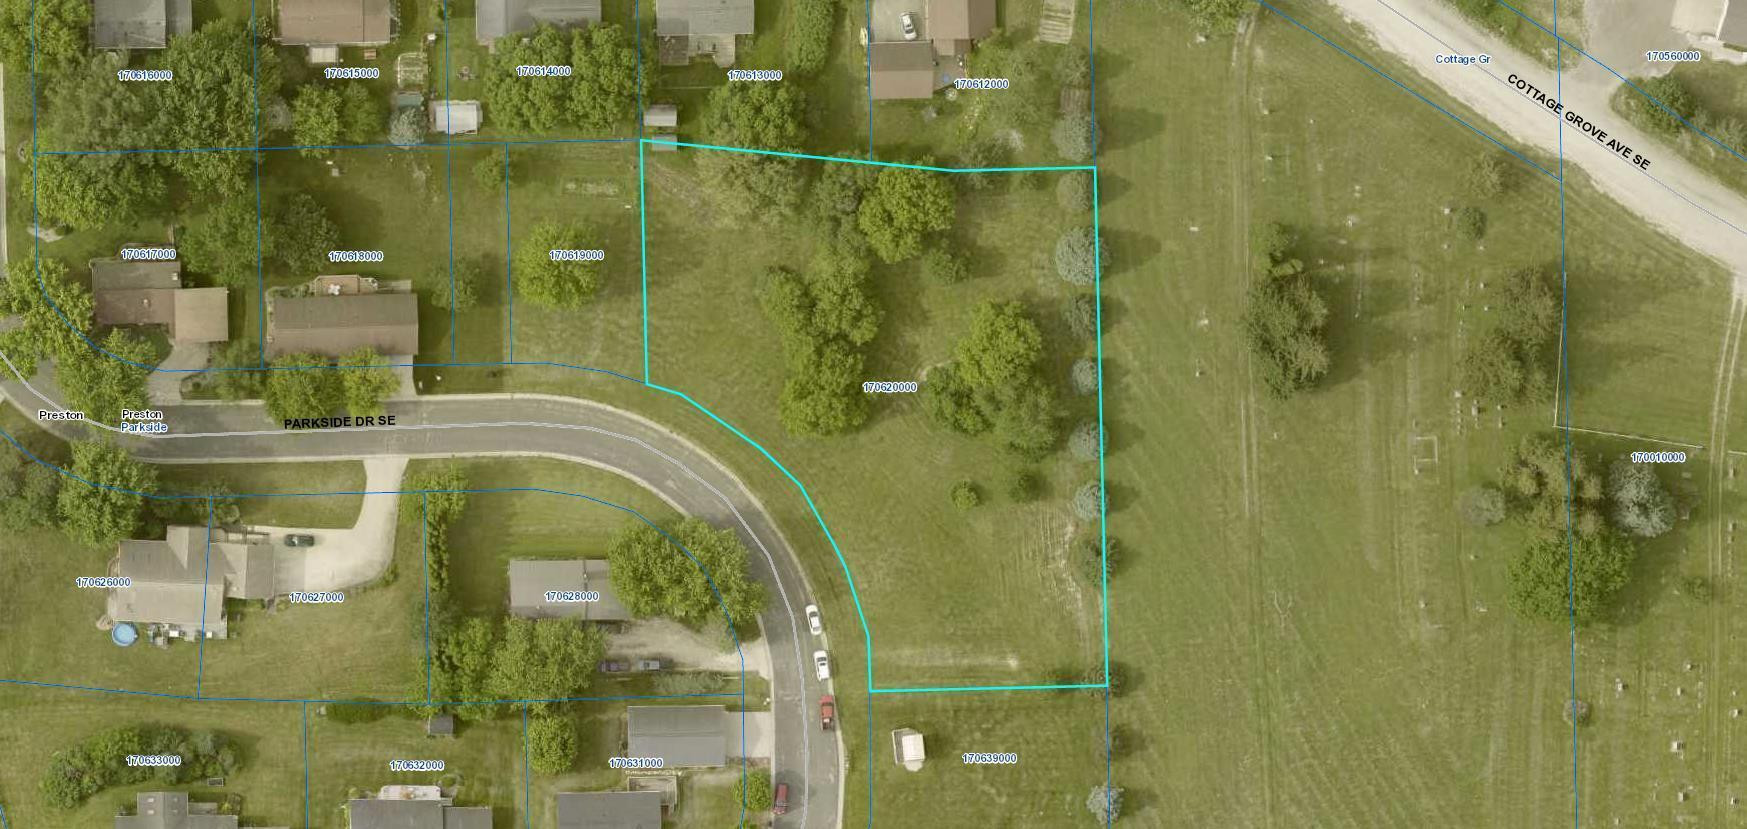 416 Parkside Drive SE, Preston, MN 55965